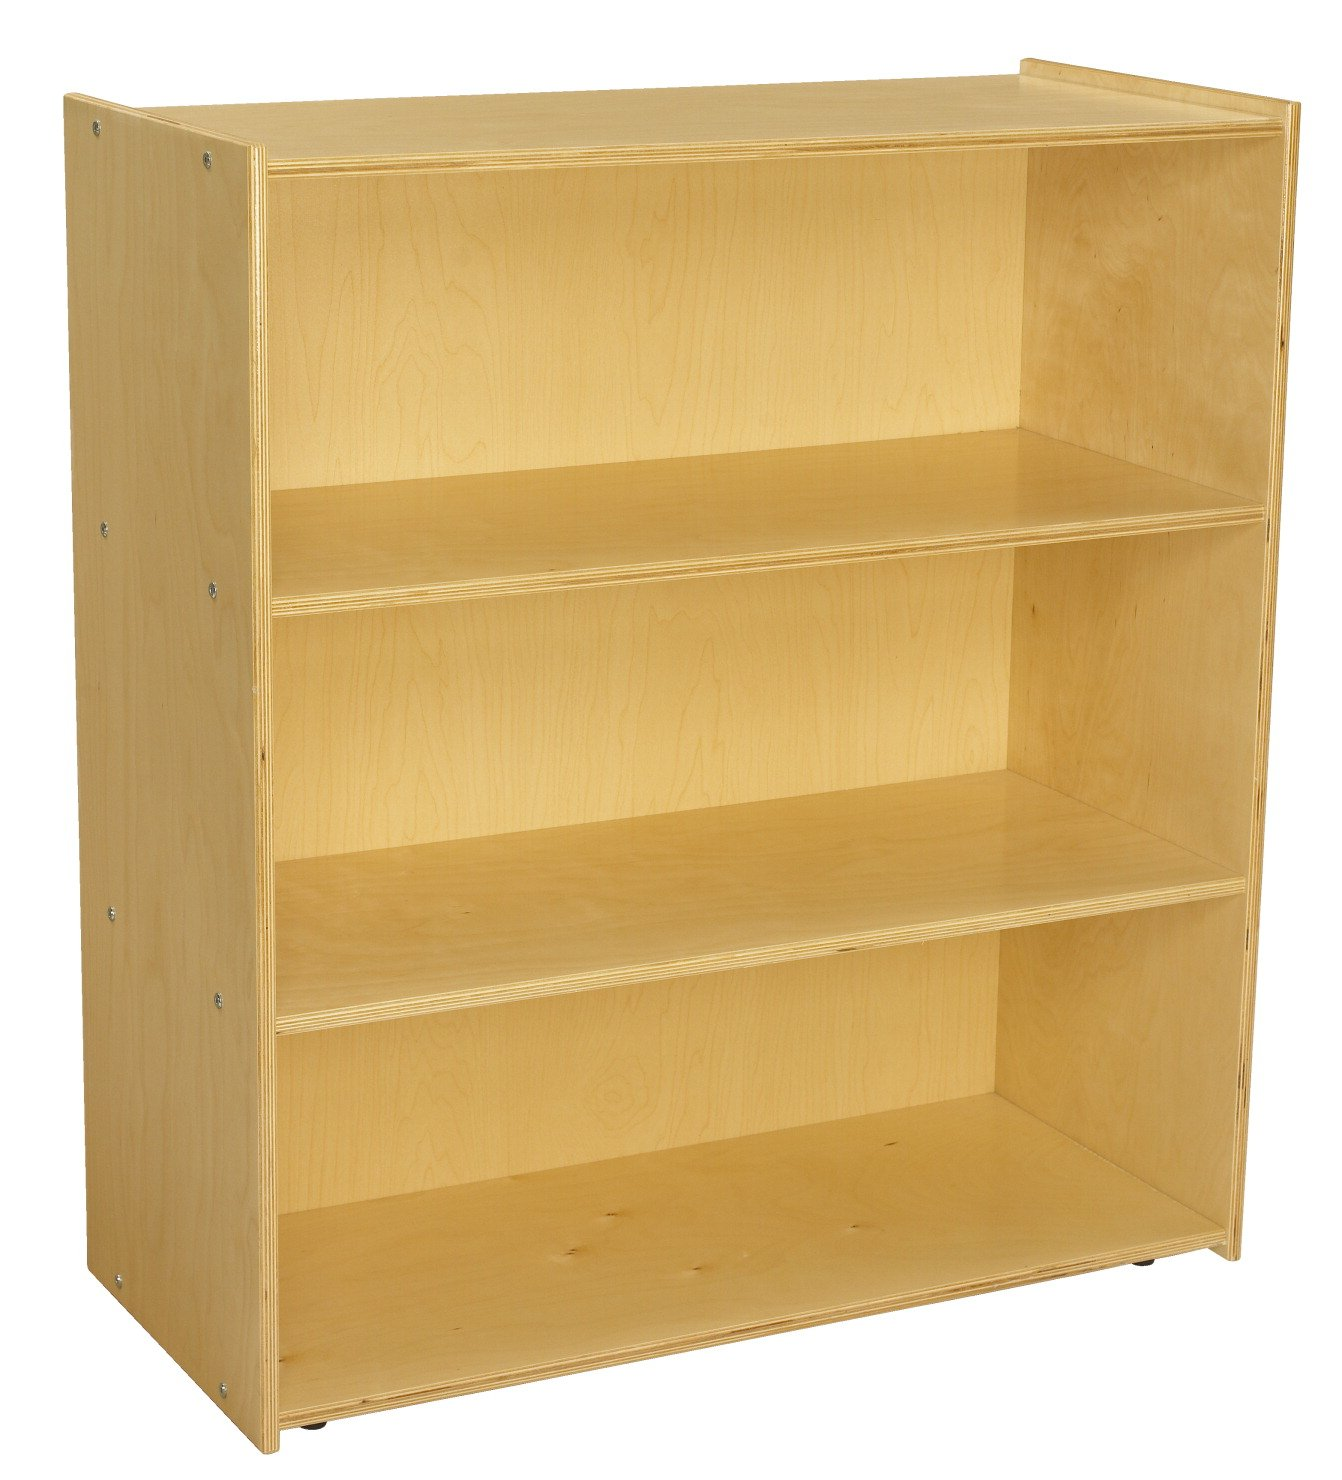 Childcraft ABC Furnishings Deep Shelf Storage Units, 36 W x 16 D x 40 H in